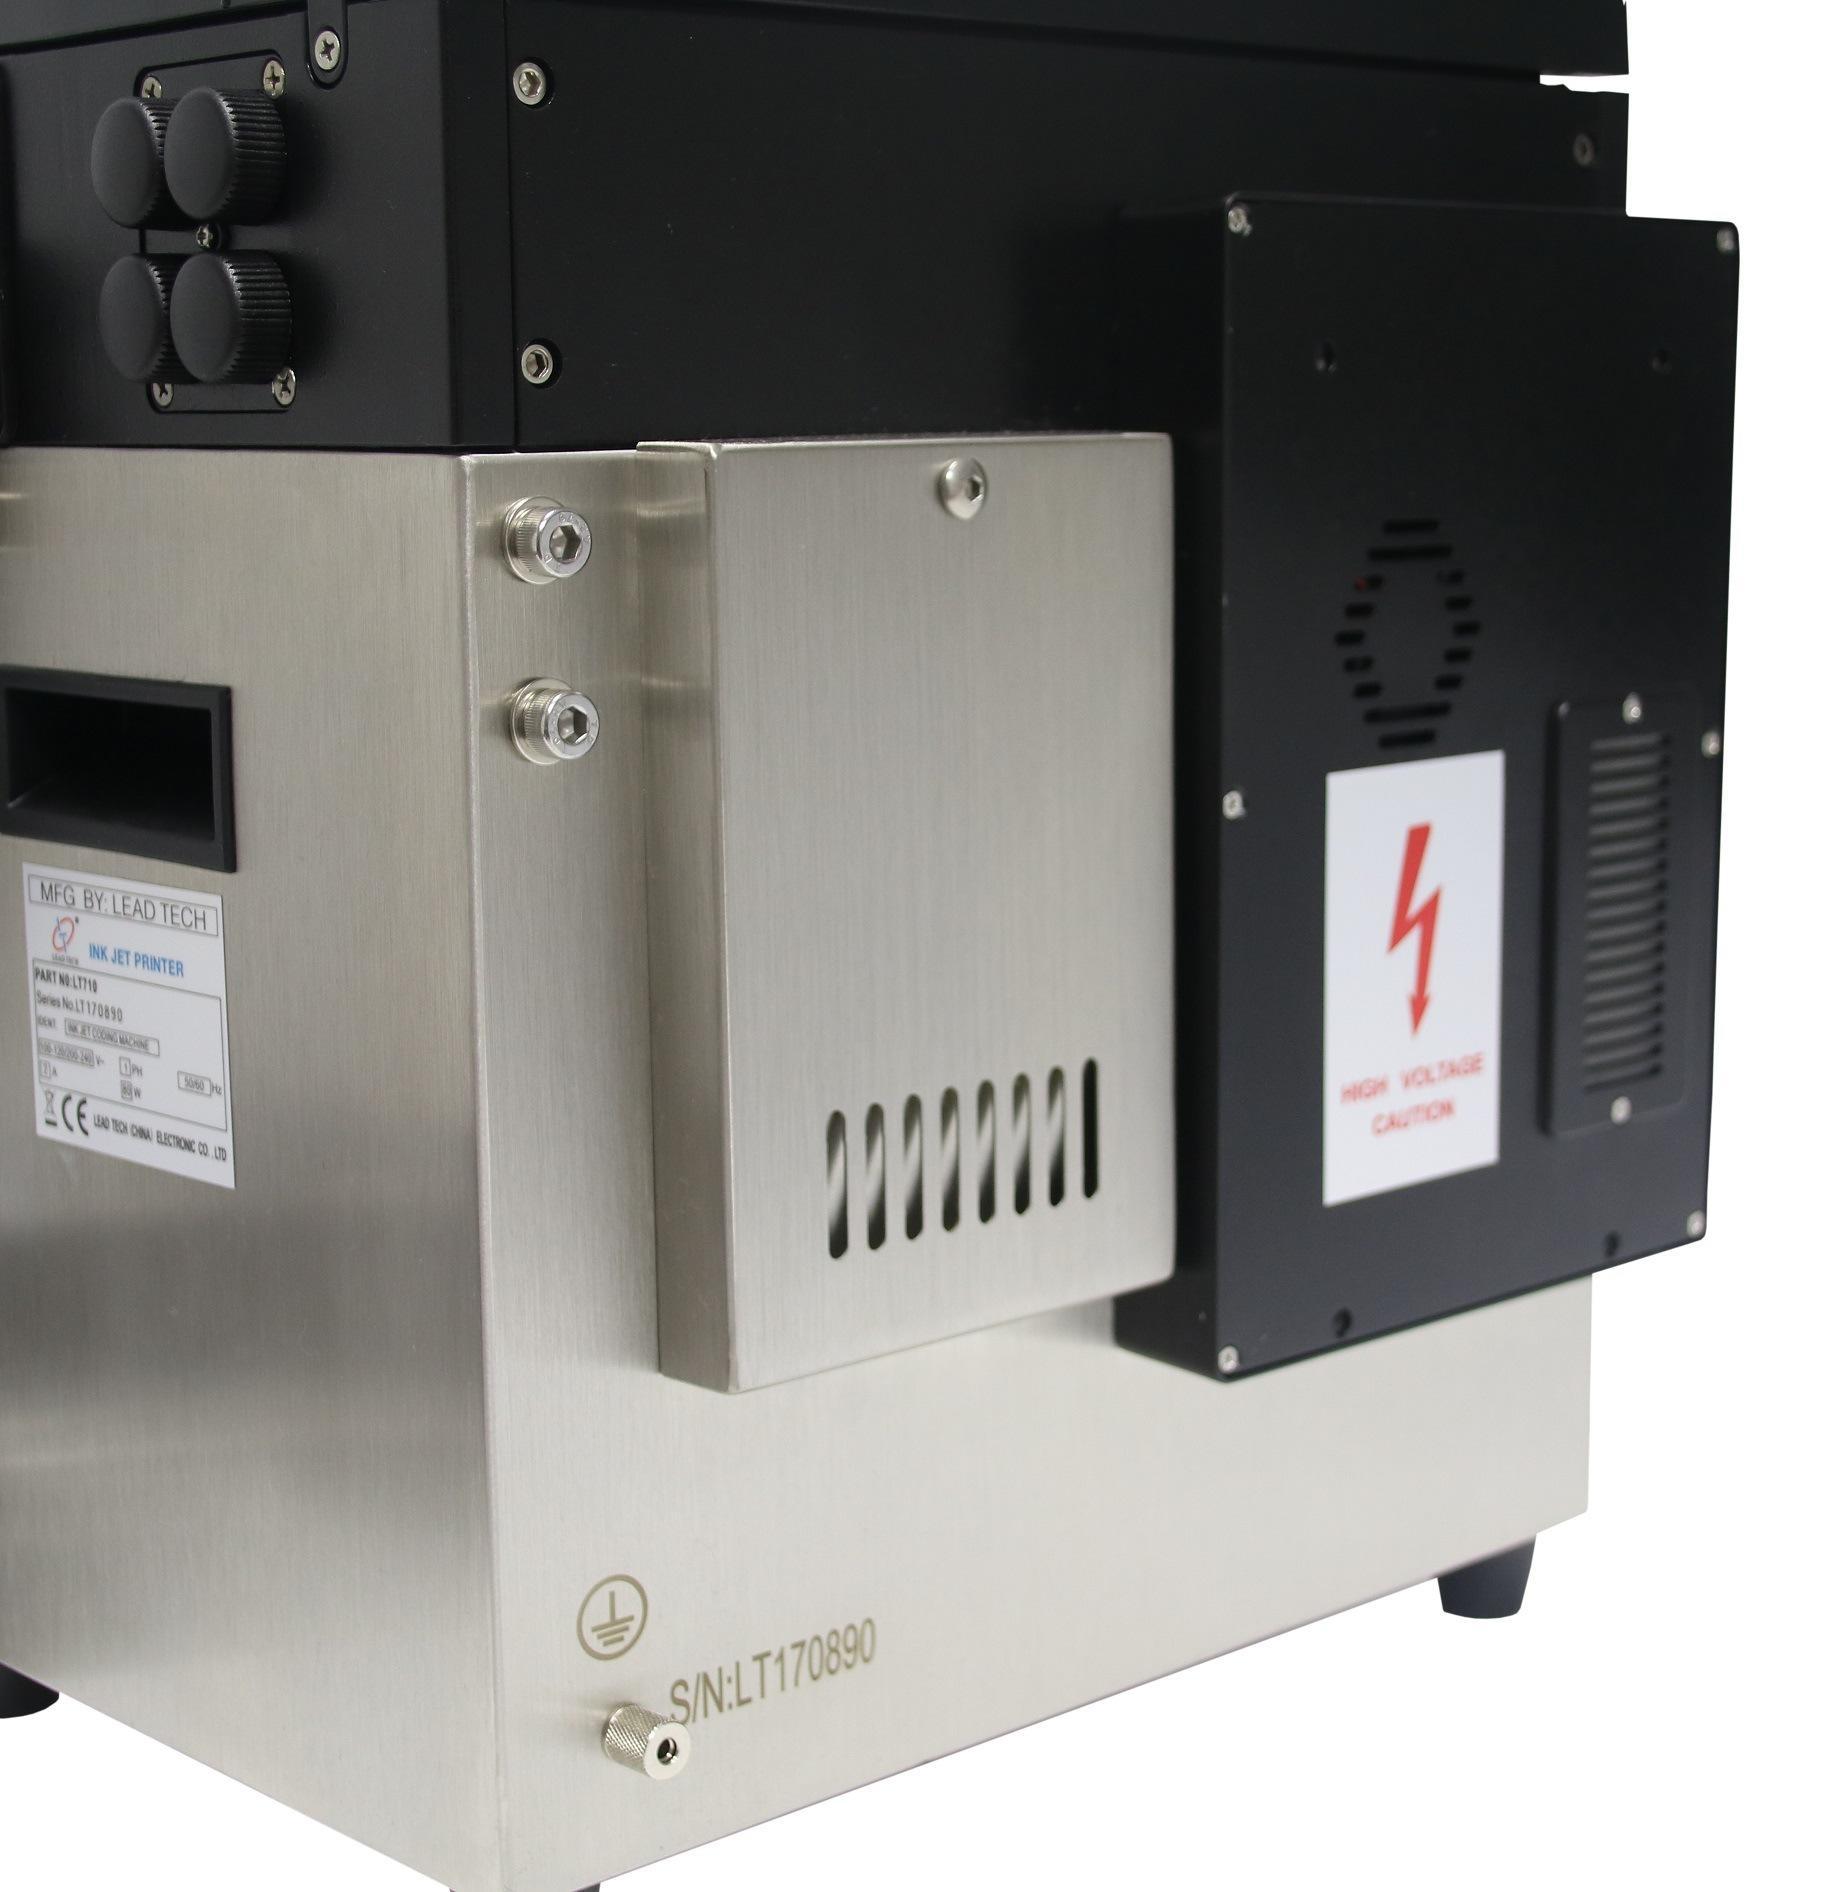 Lead Tech Lt760 Cij Inkjet Printer for Moving Head Printing